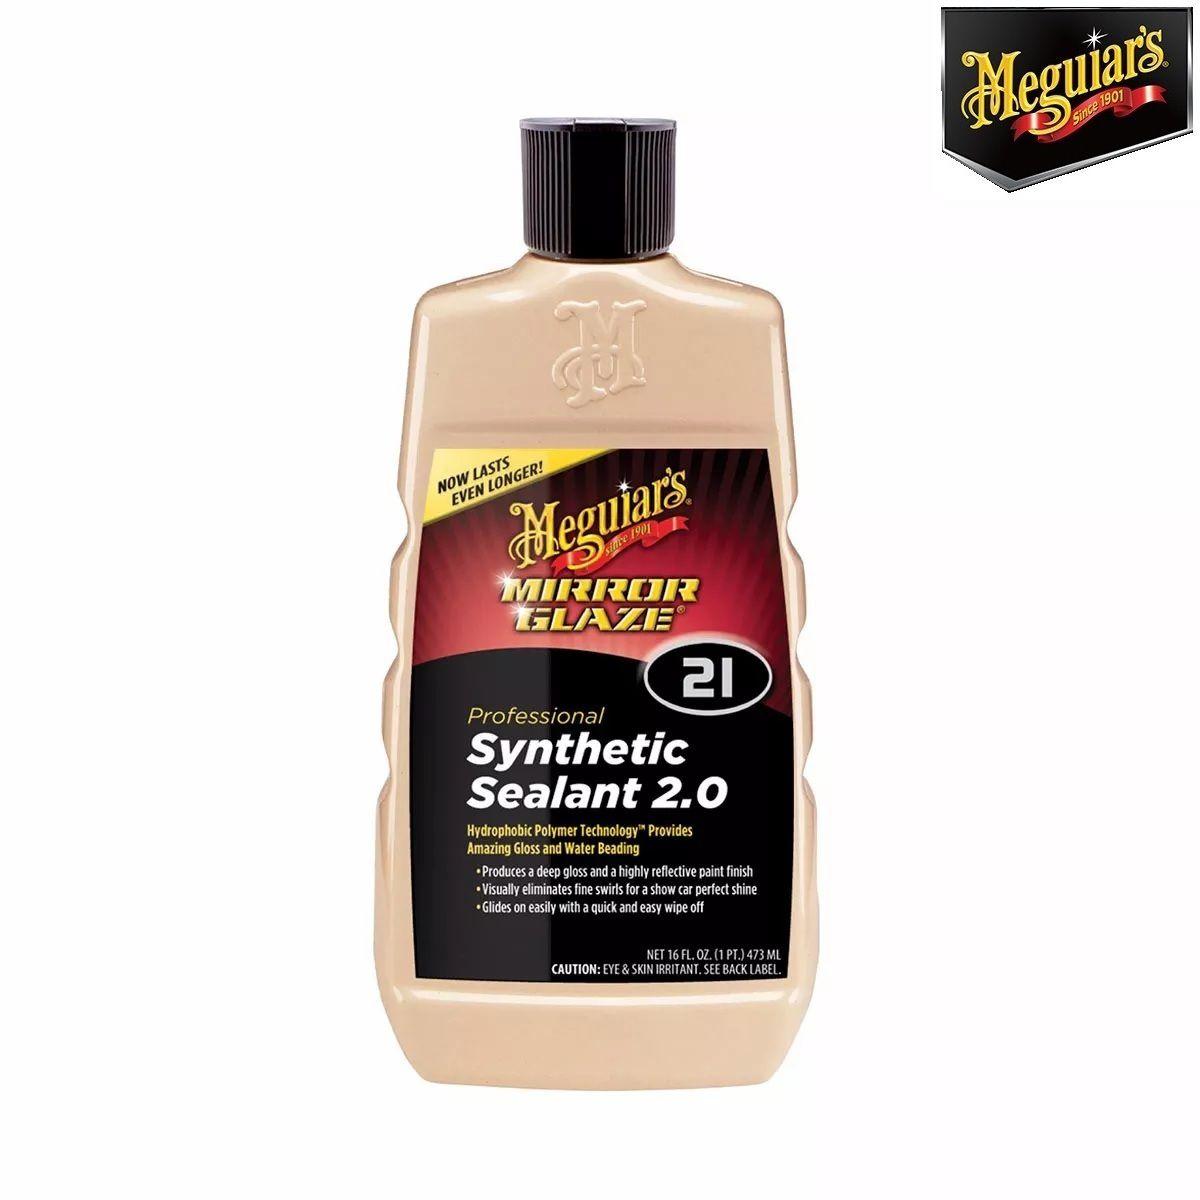 Kit Cera Ultimate Meguiars + 1 Shampoo Ultimate Meguiars + 1 Selante sintético 2.0 M2116